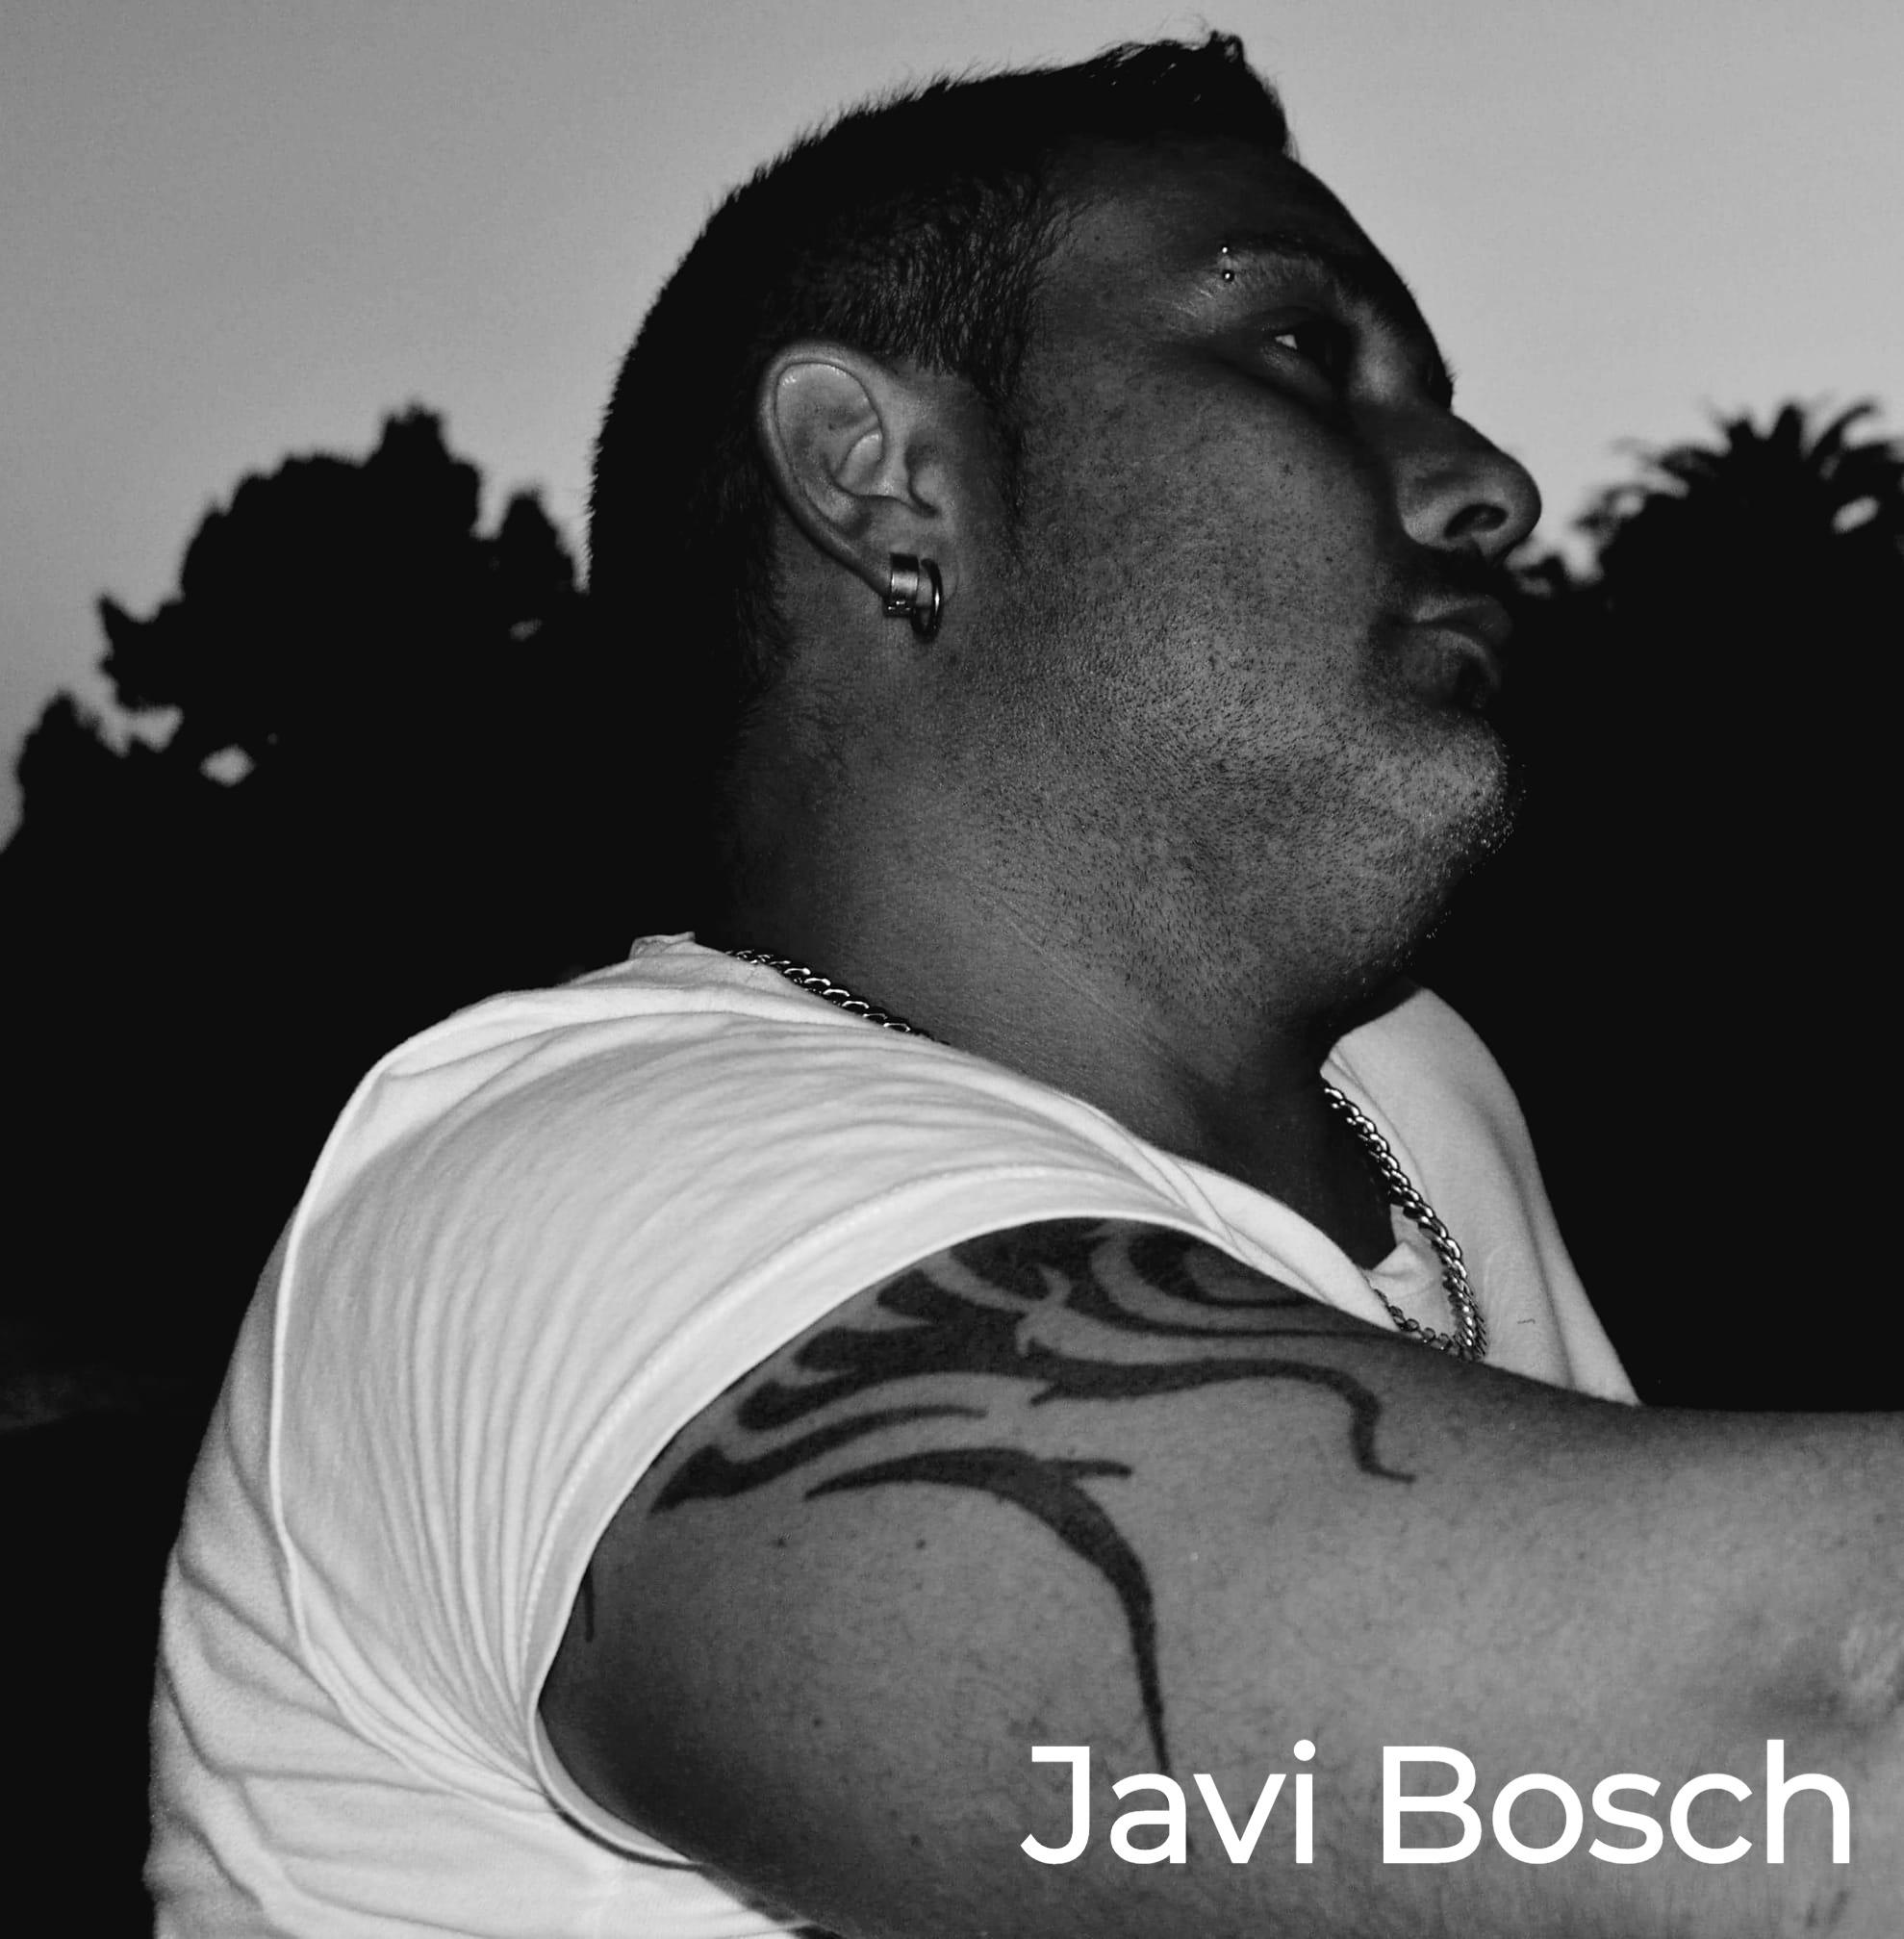 Javi Bosch